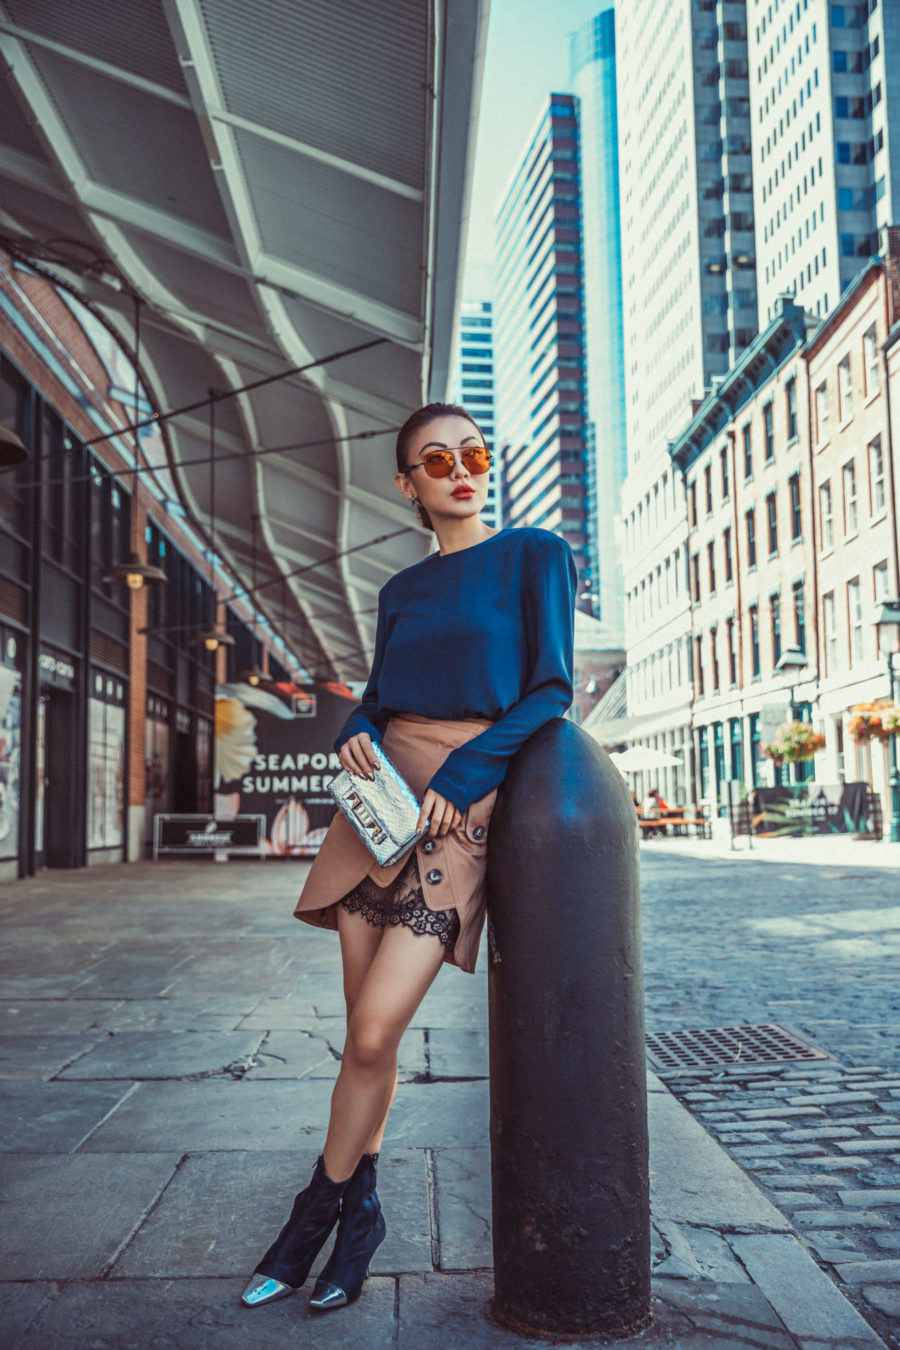 Tibi and Self-Portrait NYFW Day 4 // NotJessFashion